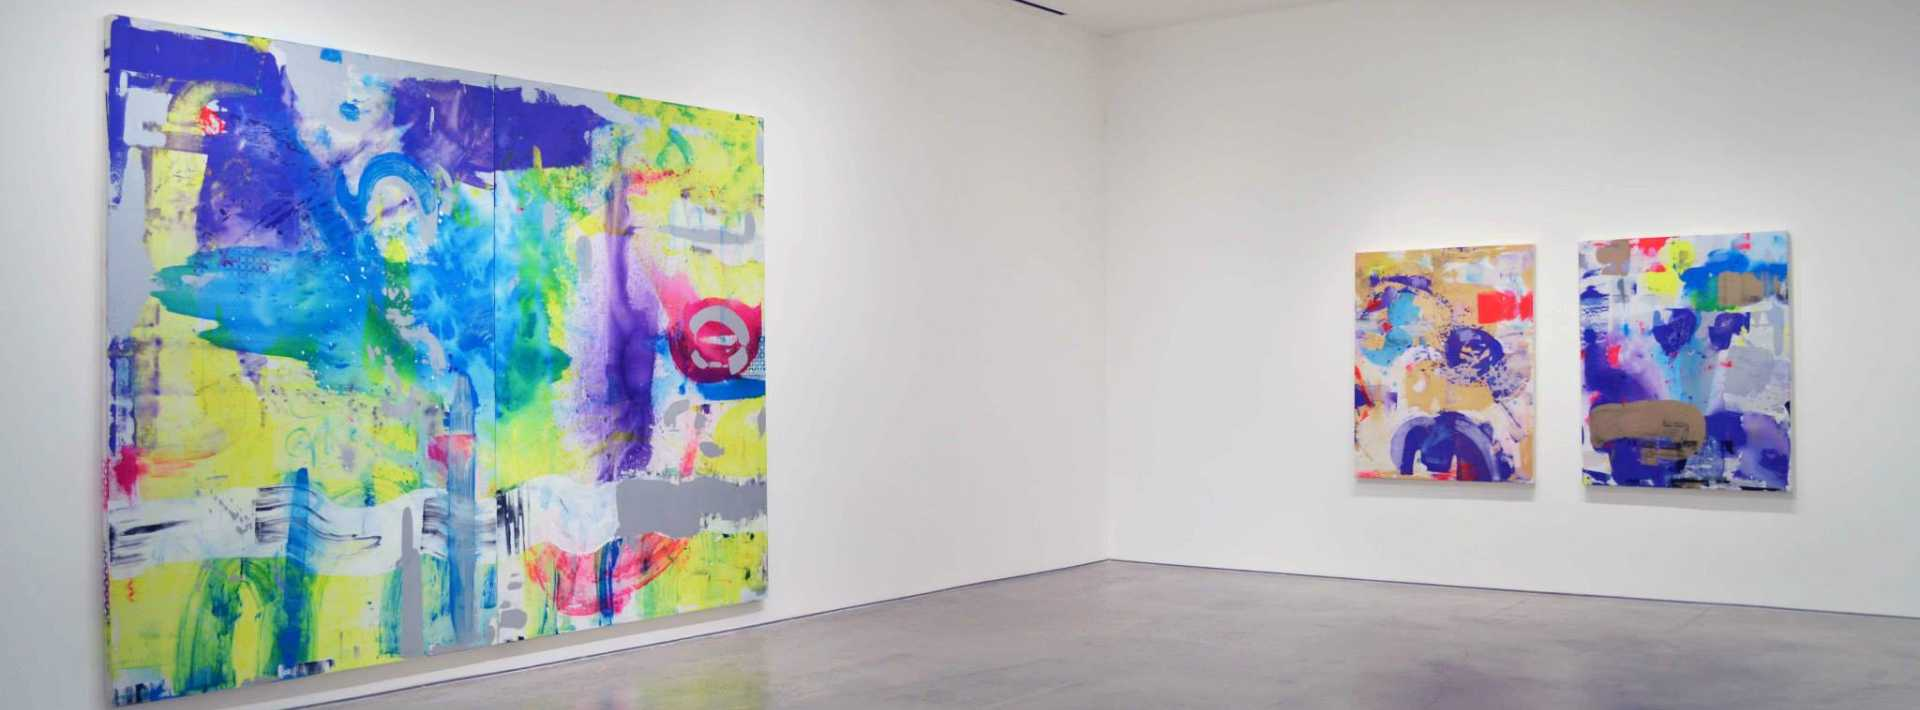 Watercolor art galleries in houston - Barbara Davis Gallery